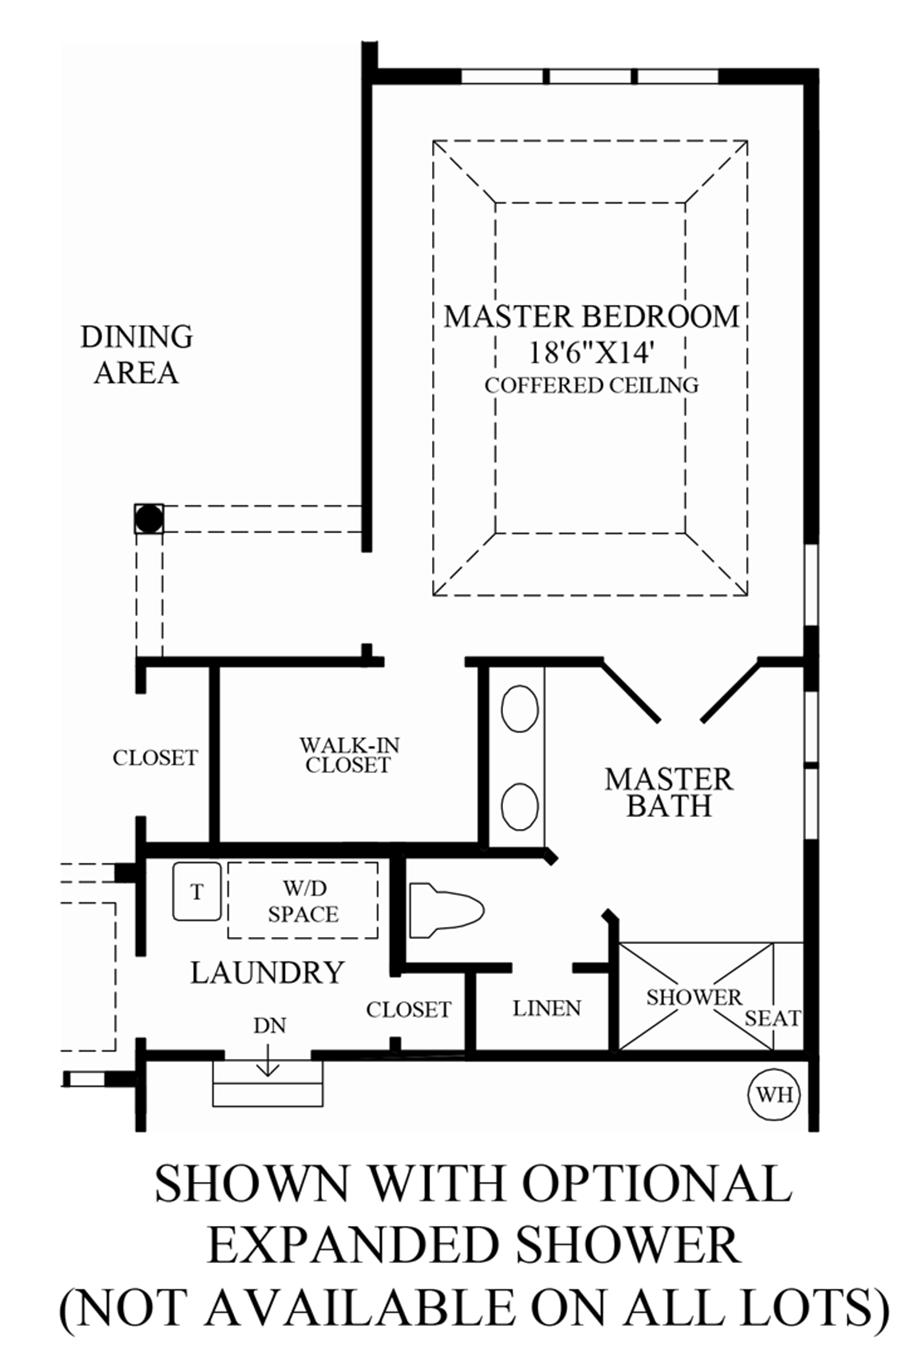 Optional Expanded Shower Floor Plan